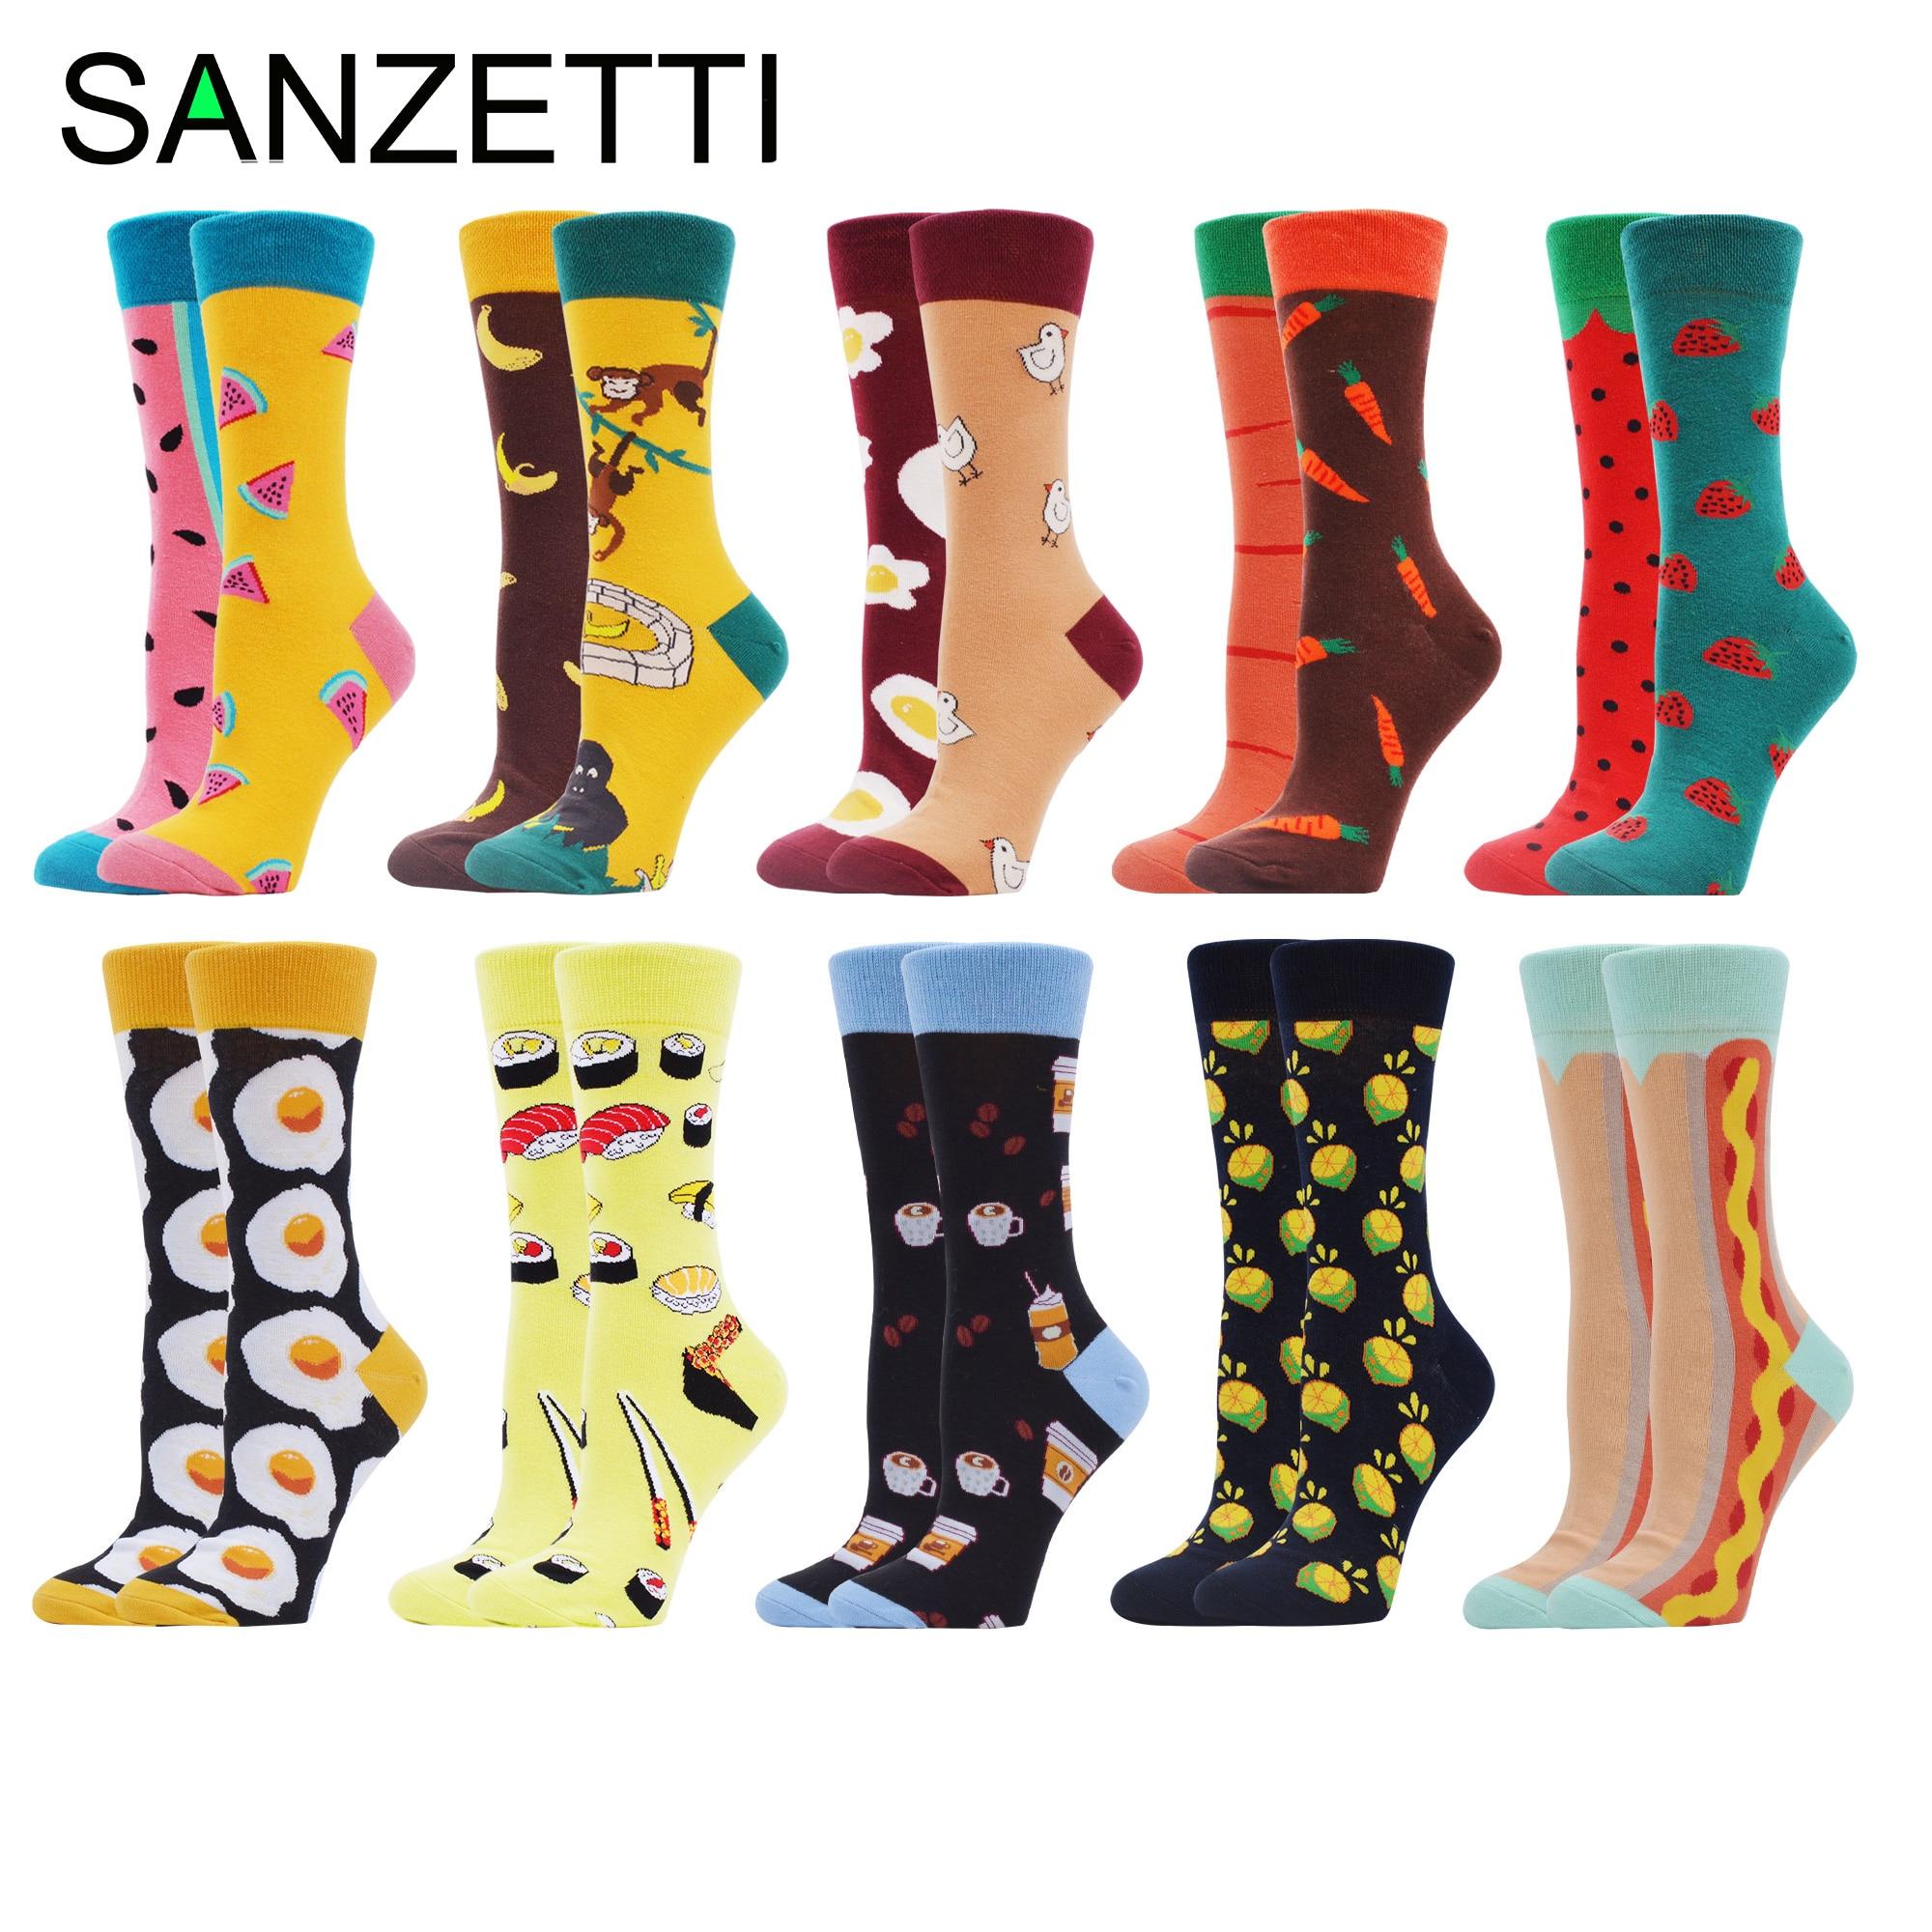 SANZETTI 10 Pairs New Women Combed Cotton Socks Multi Colorful Happy Creative Fruit Novelty Wedding Bright Gifts Dress SocksSocks   -